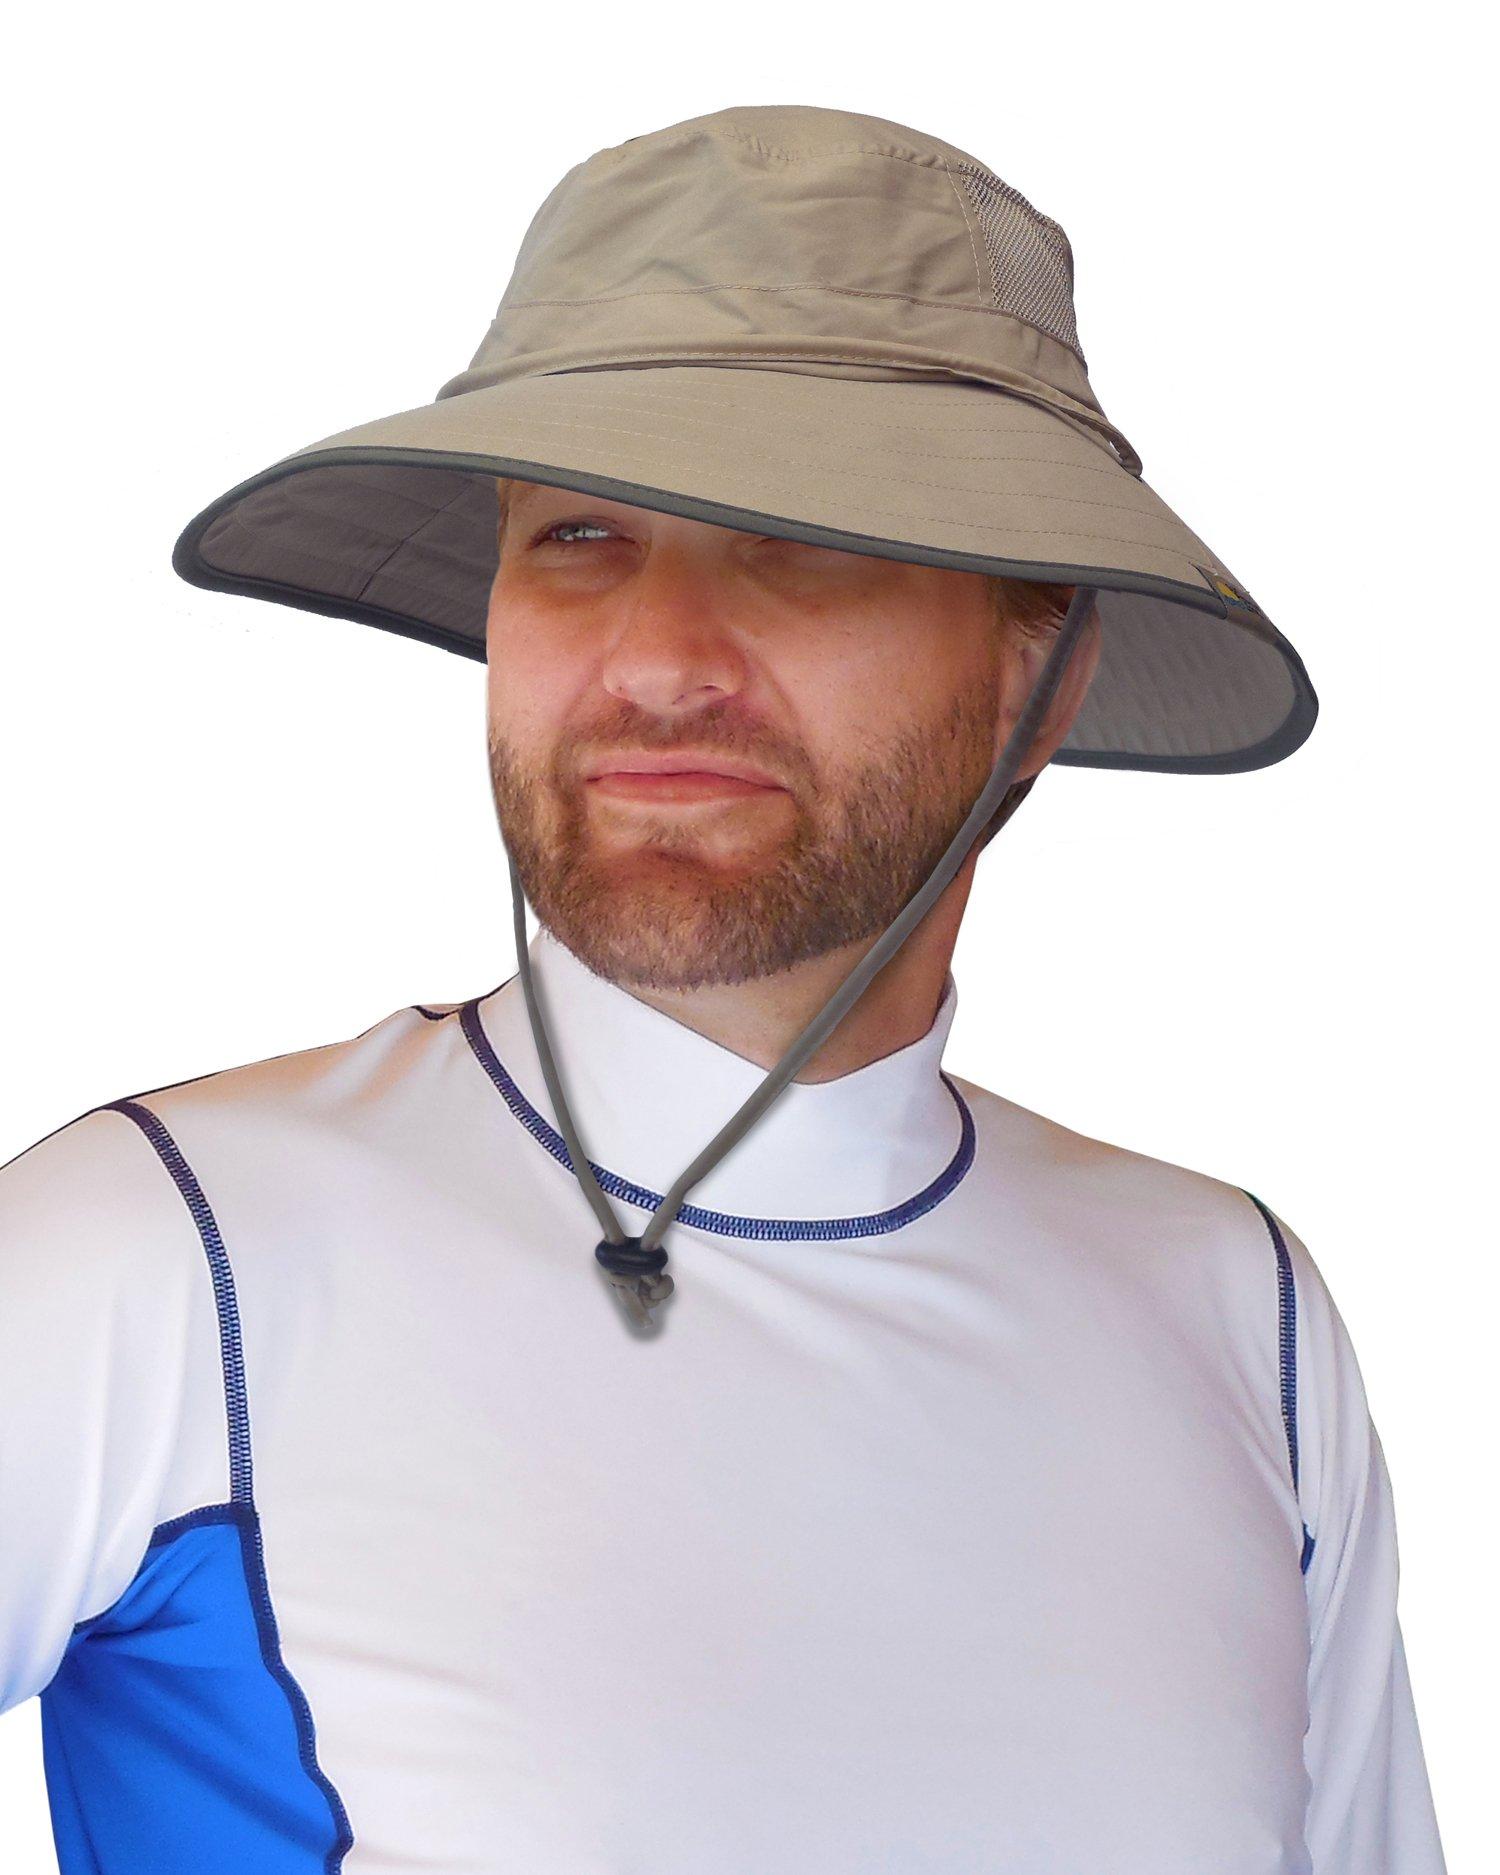 847bbd3b68d Sun Protection Zone Unisex Lightweight Adjustable Outdoor Booney Hat (100  SPF